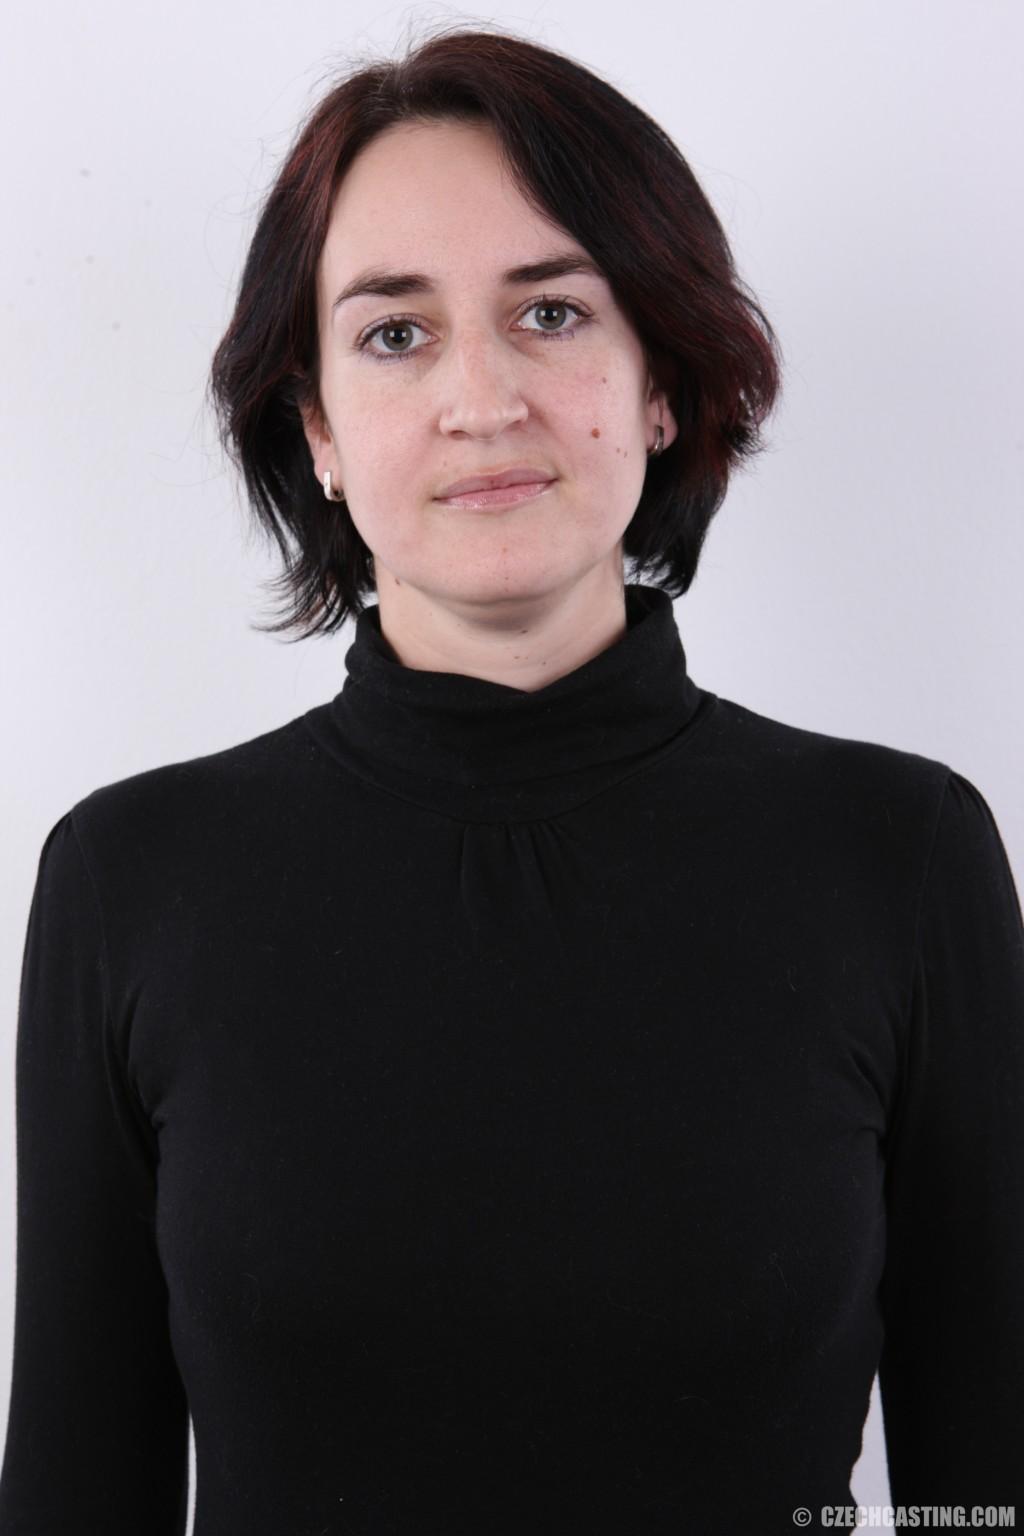 Czech casting vendula 3052